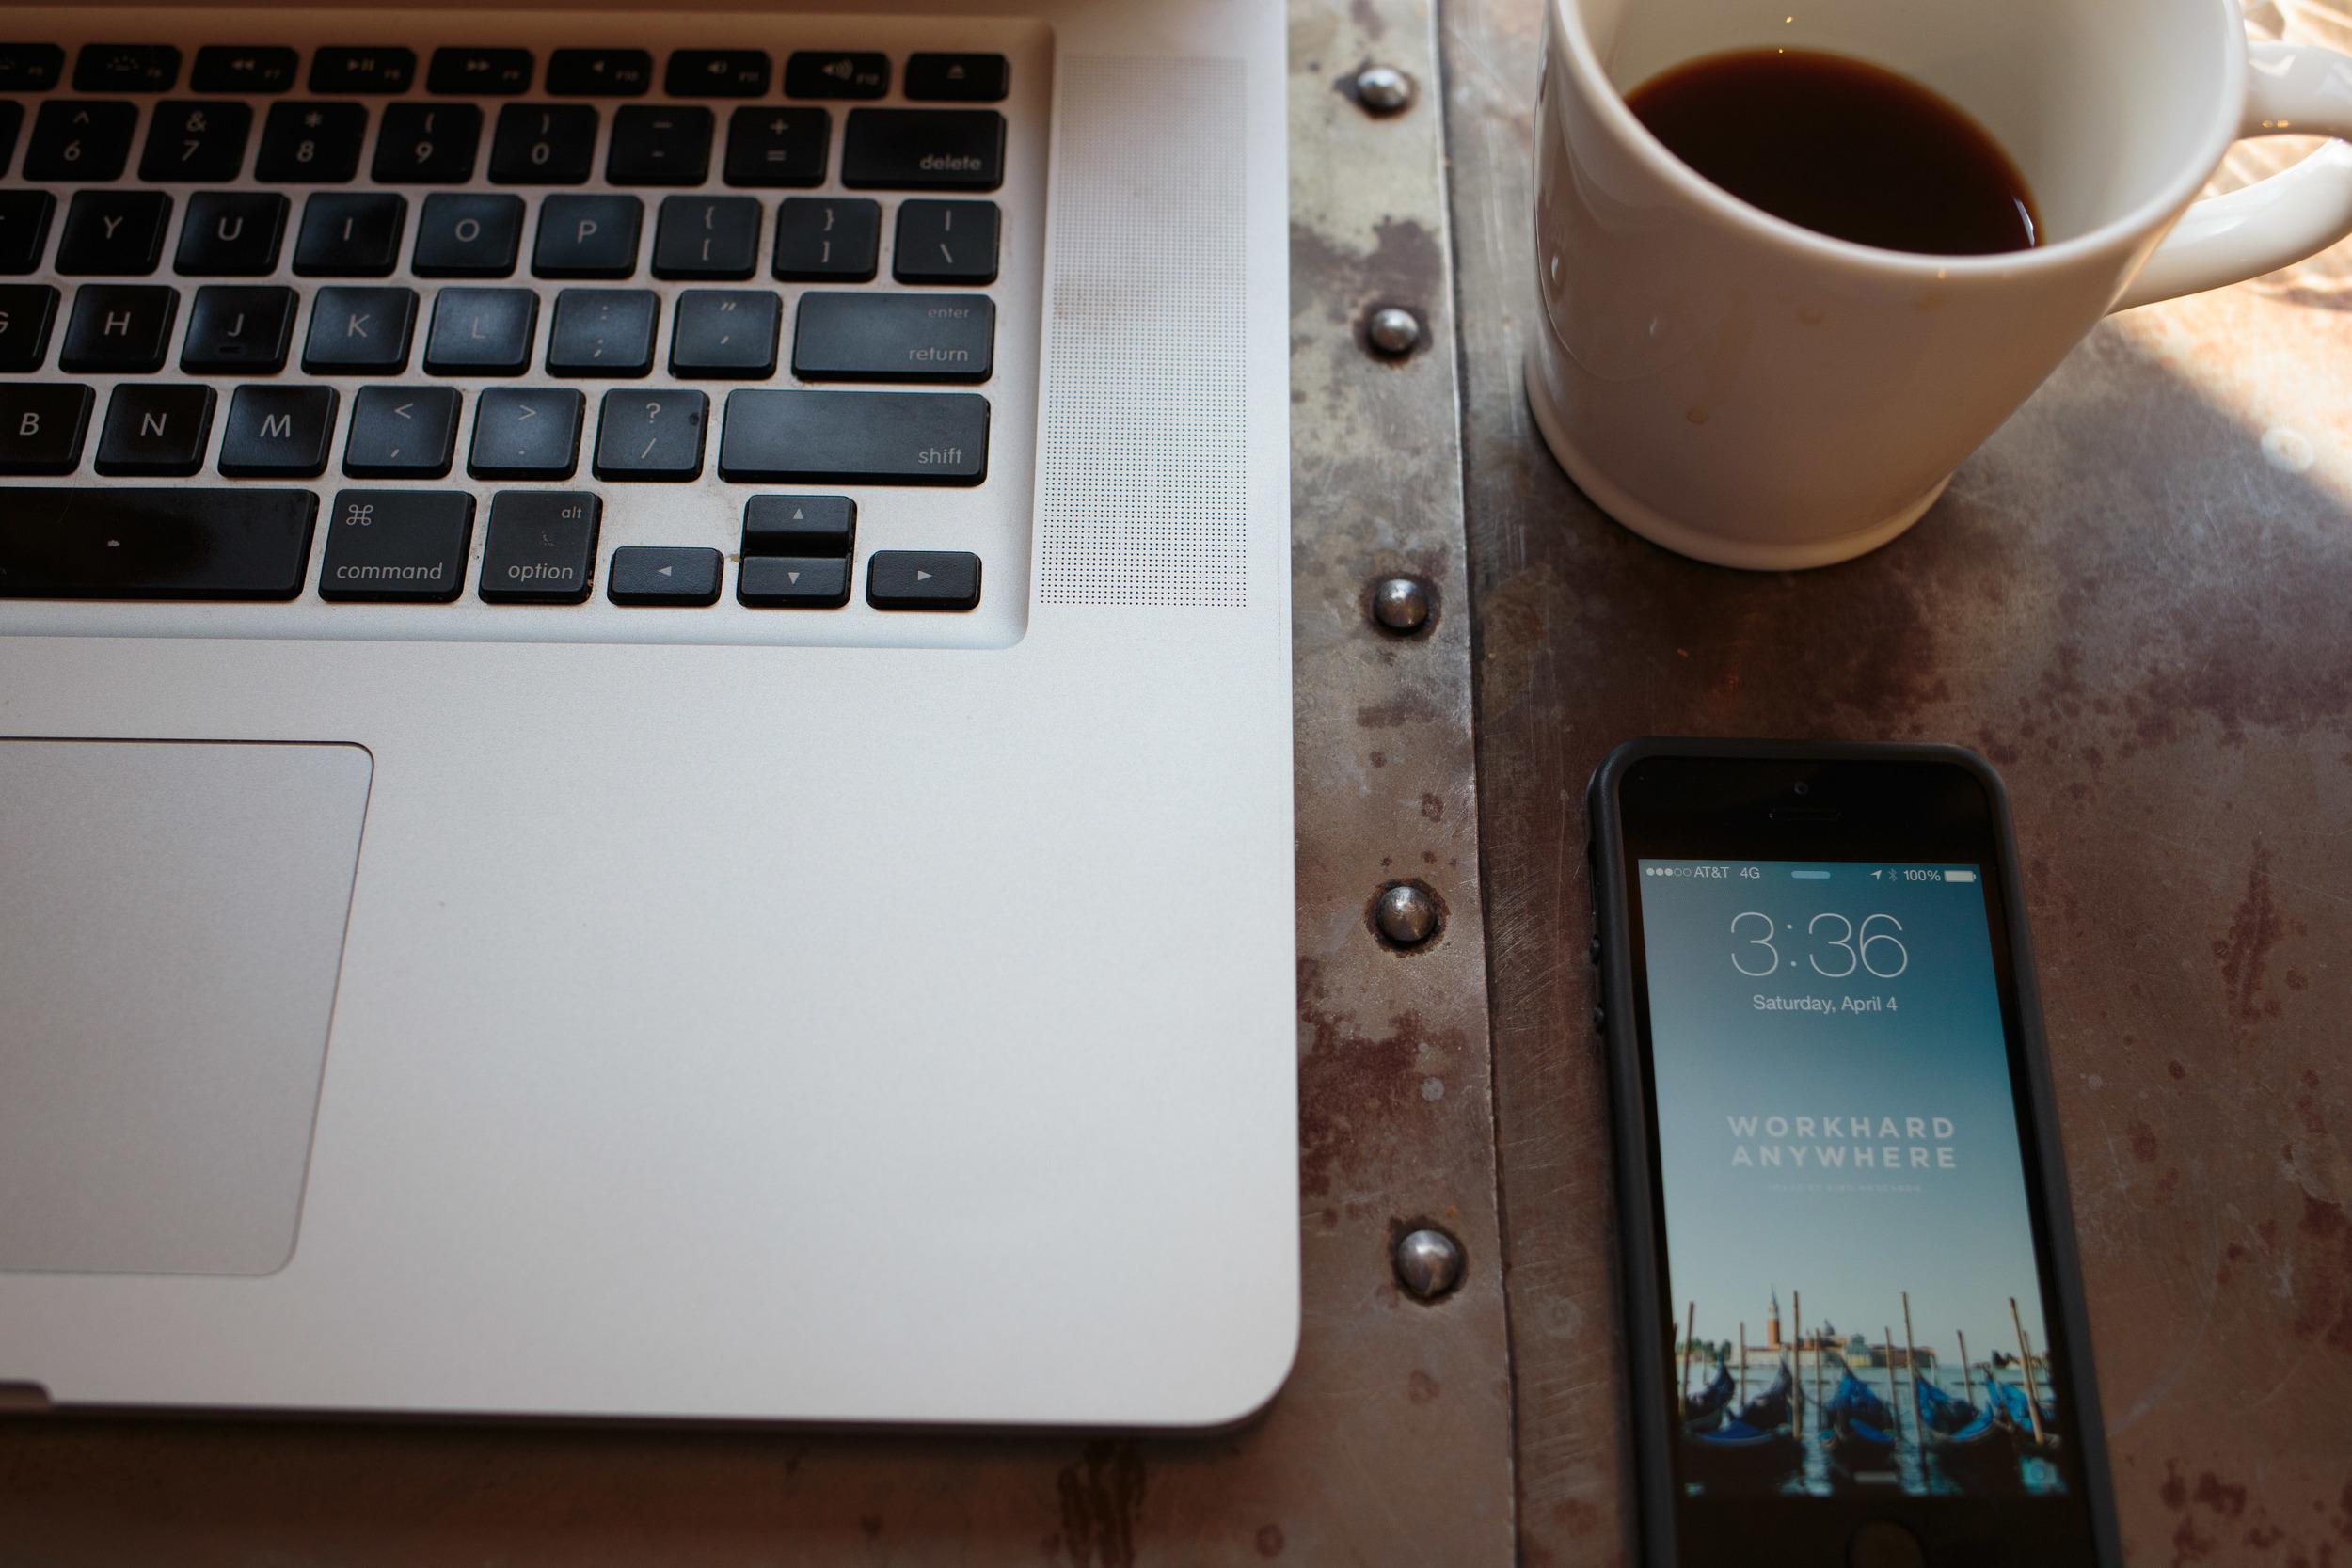 Work Hard Anywhere Cafe Salt Lake City Cafe Social Media Marketing